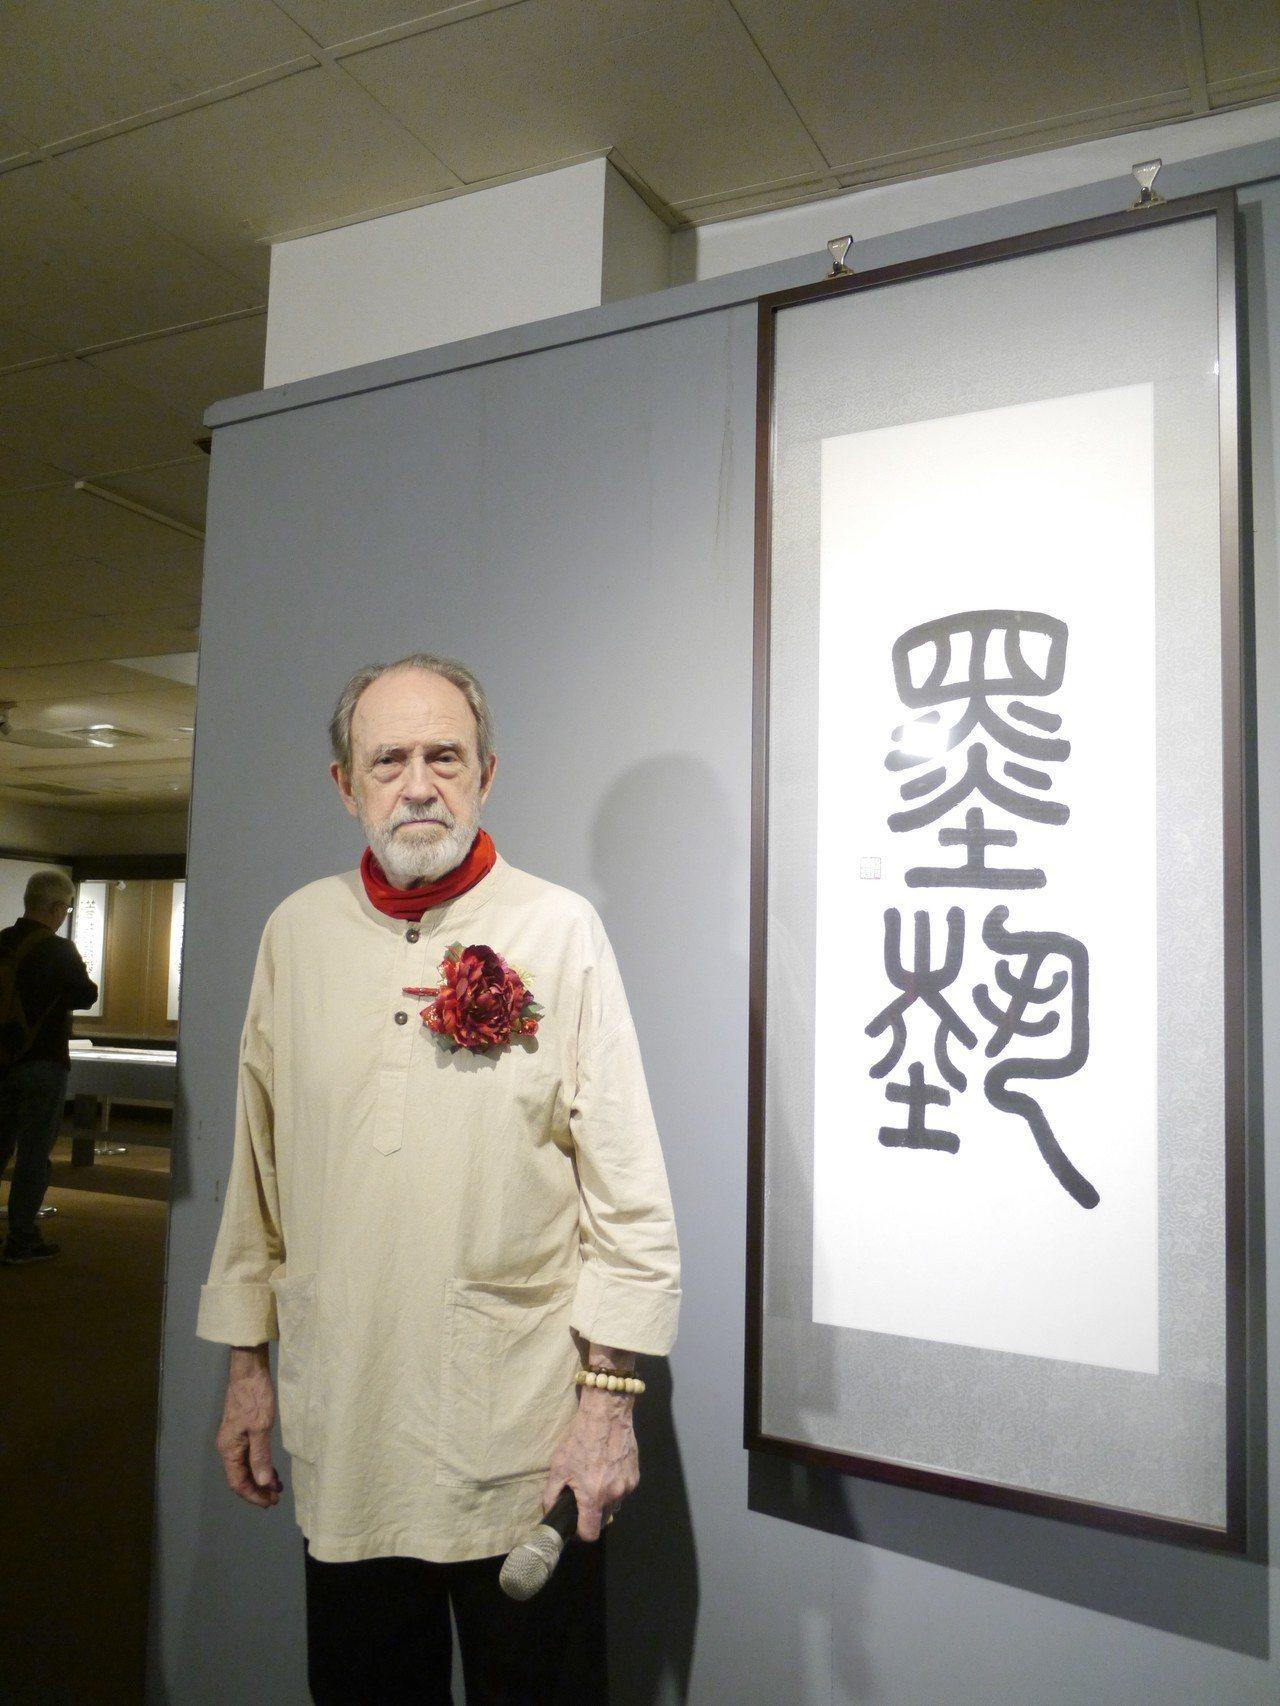 Gary Edson不會說中文,平日勤練書法,獨鍾篆體與隸書。記者徐白櫻/攝影